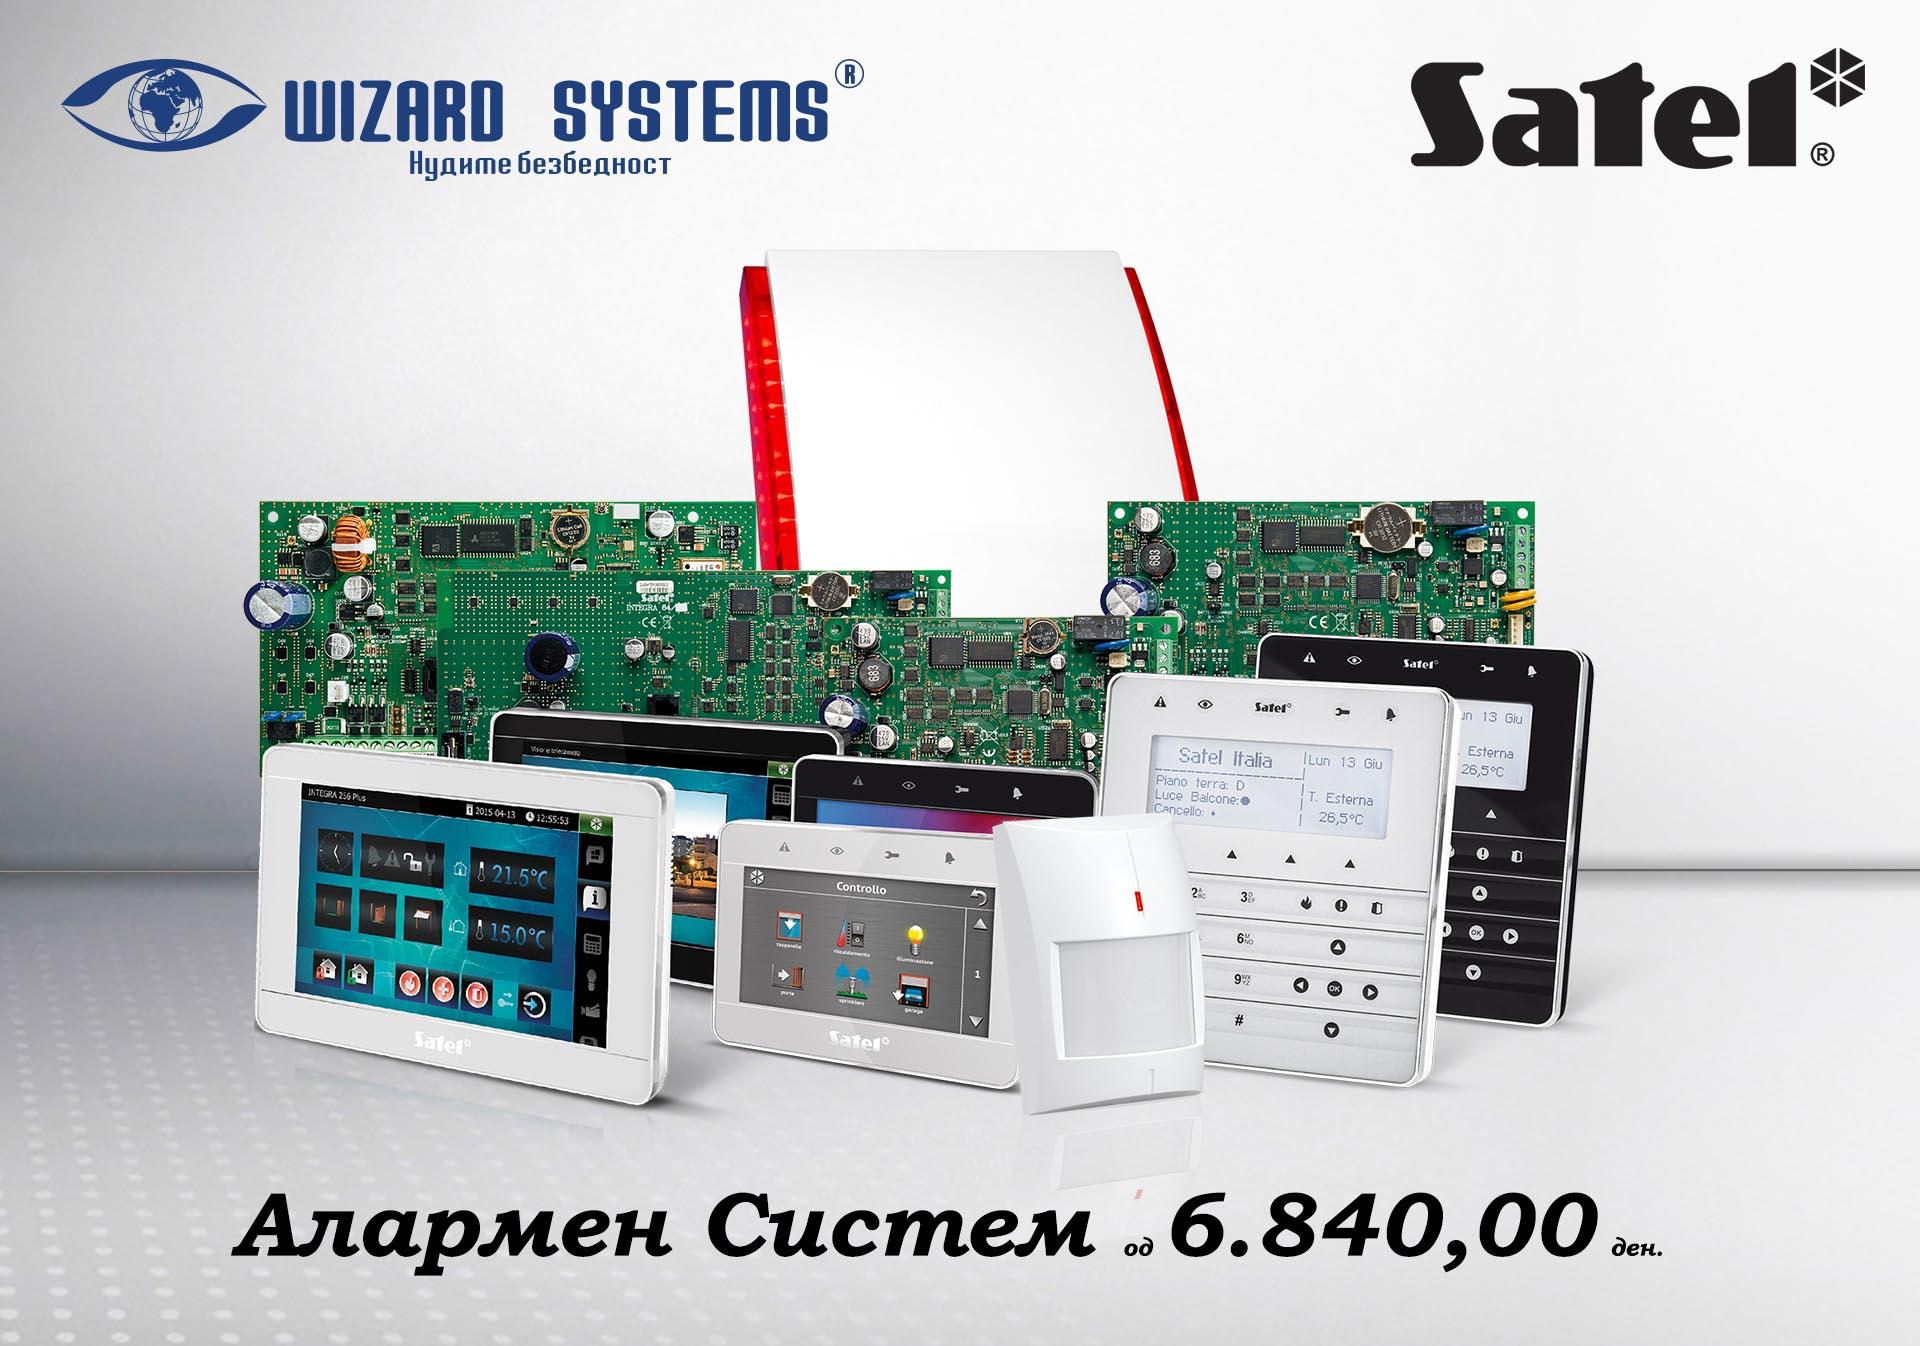 1. Alarmen sistem